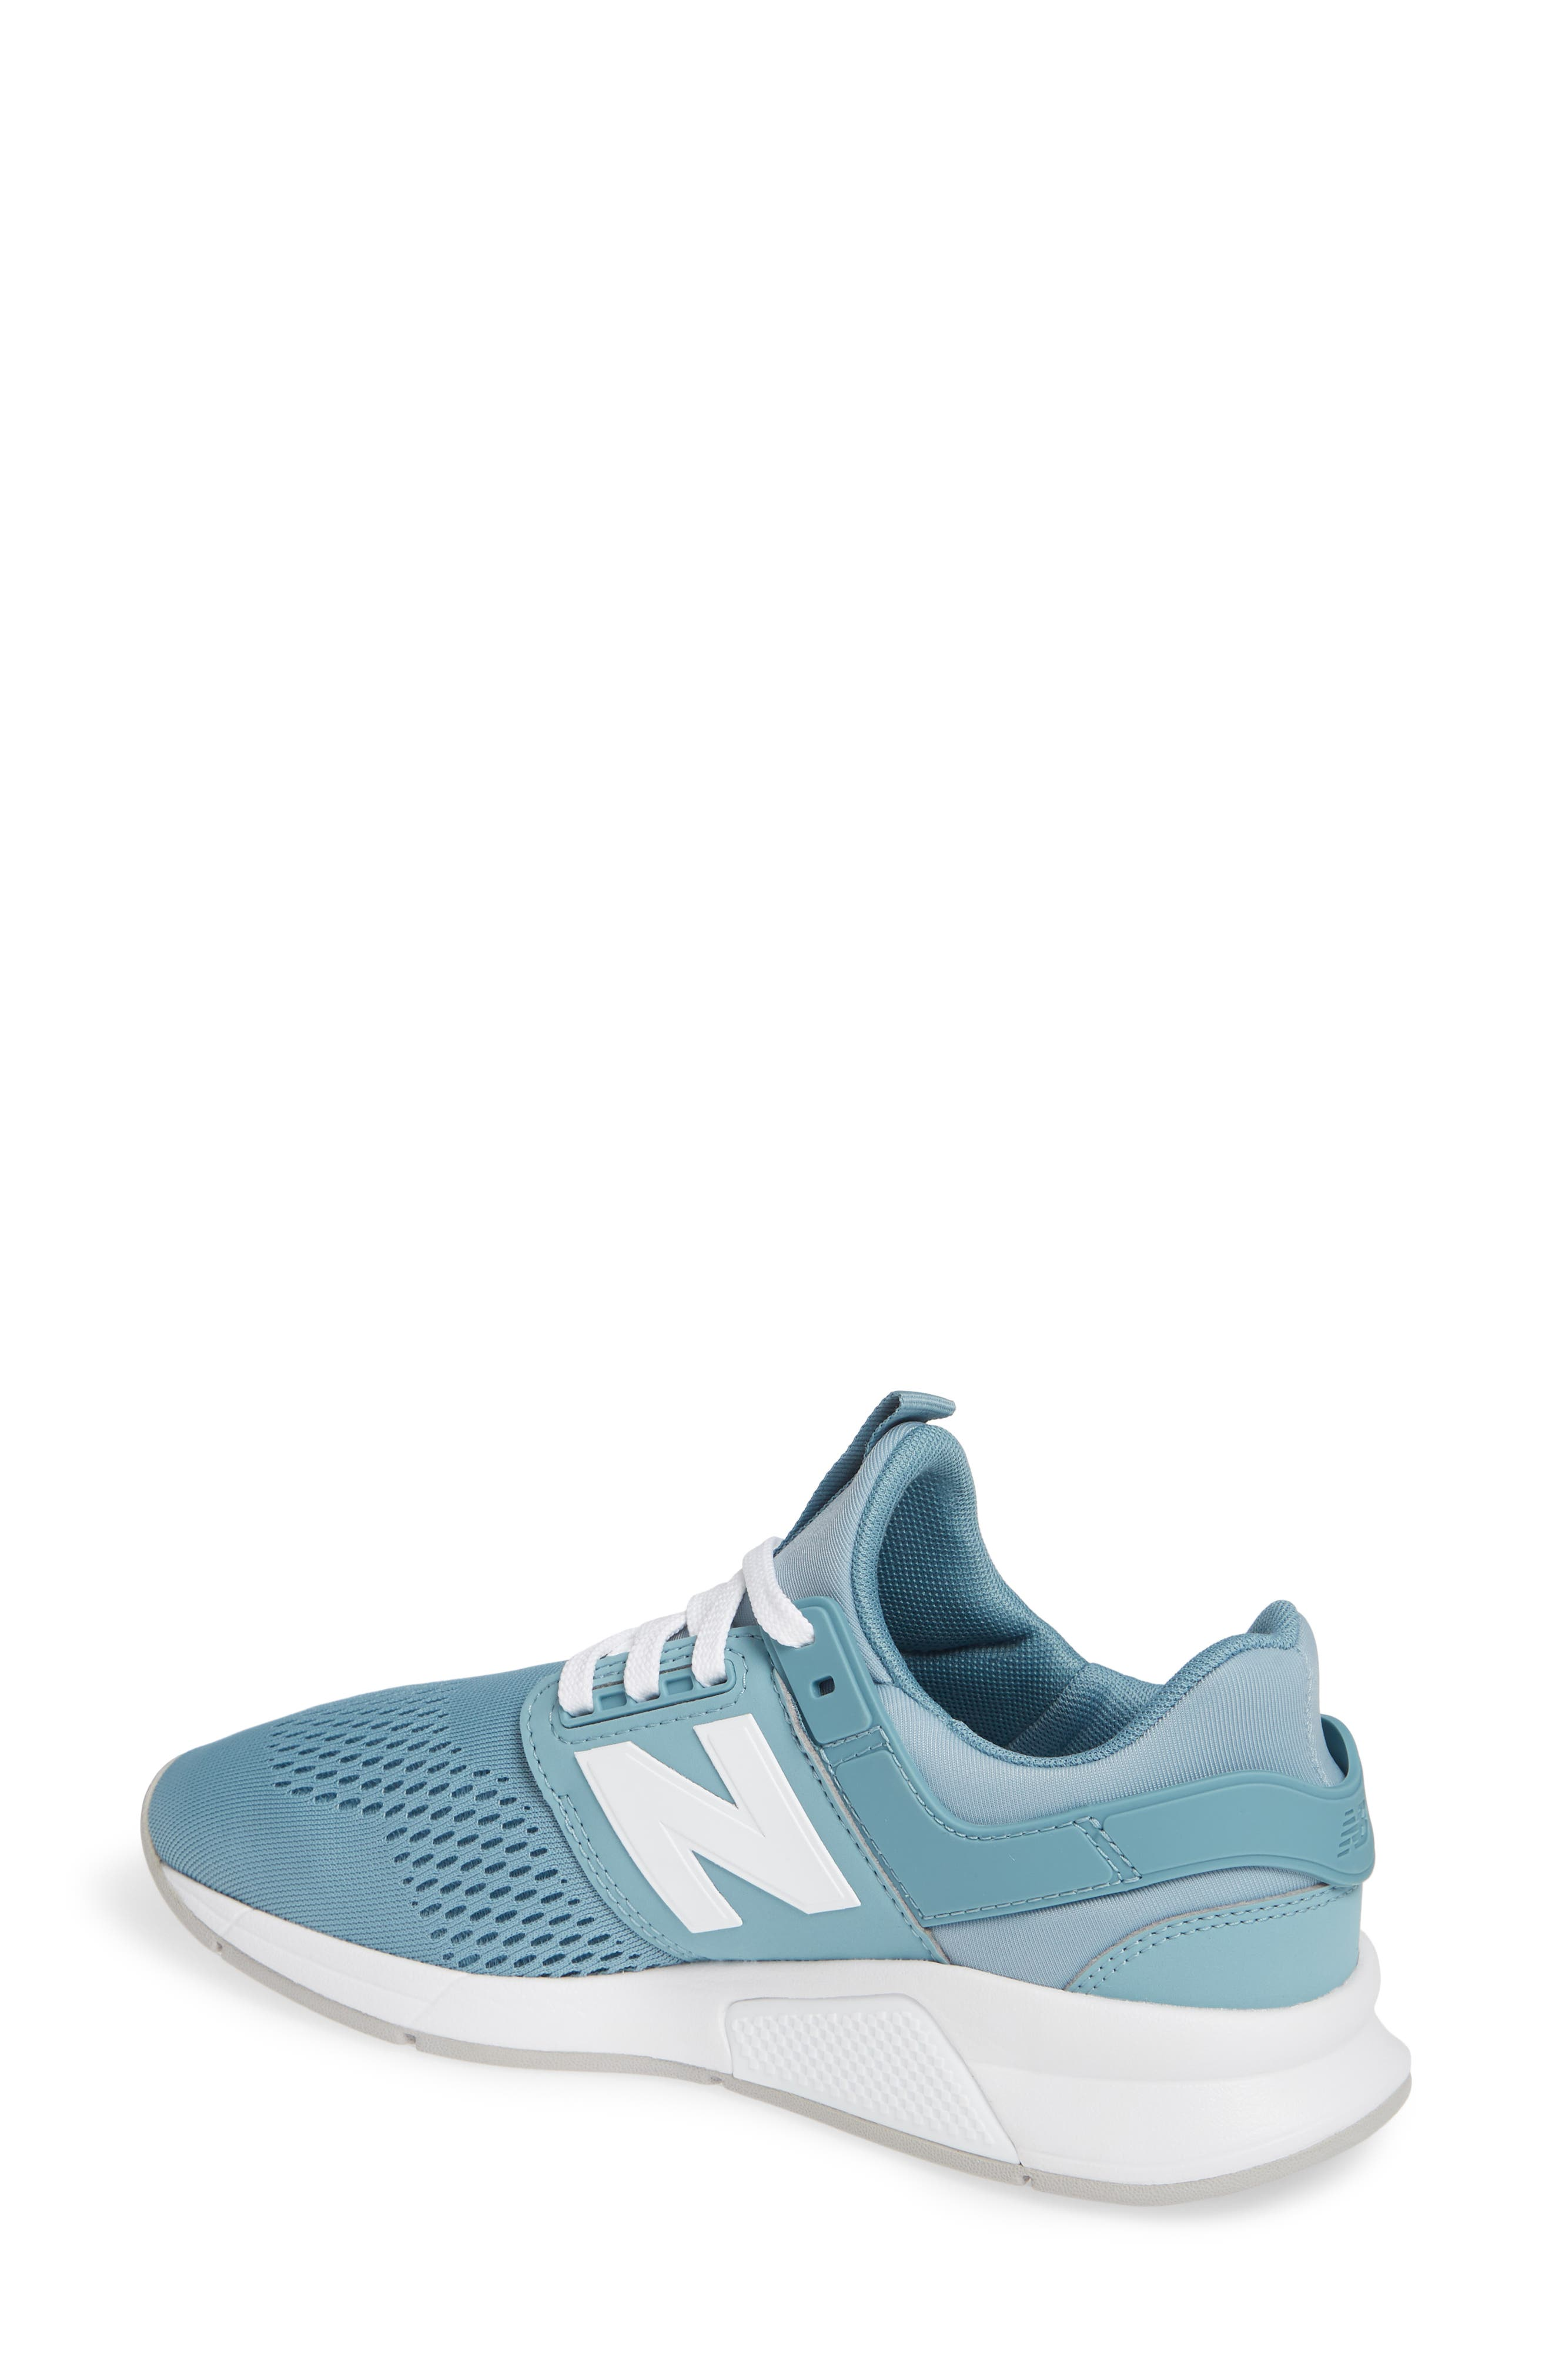 247 Sneaker,                             Alternate thumbnail 2, color,                             SMOKE BLUE